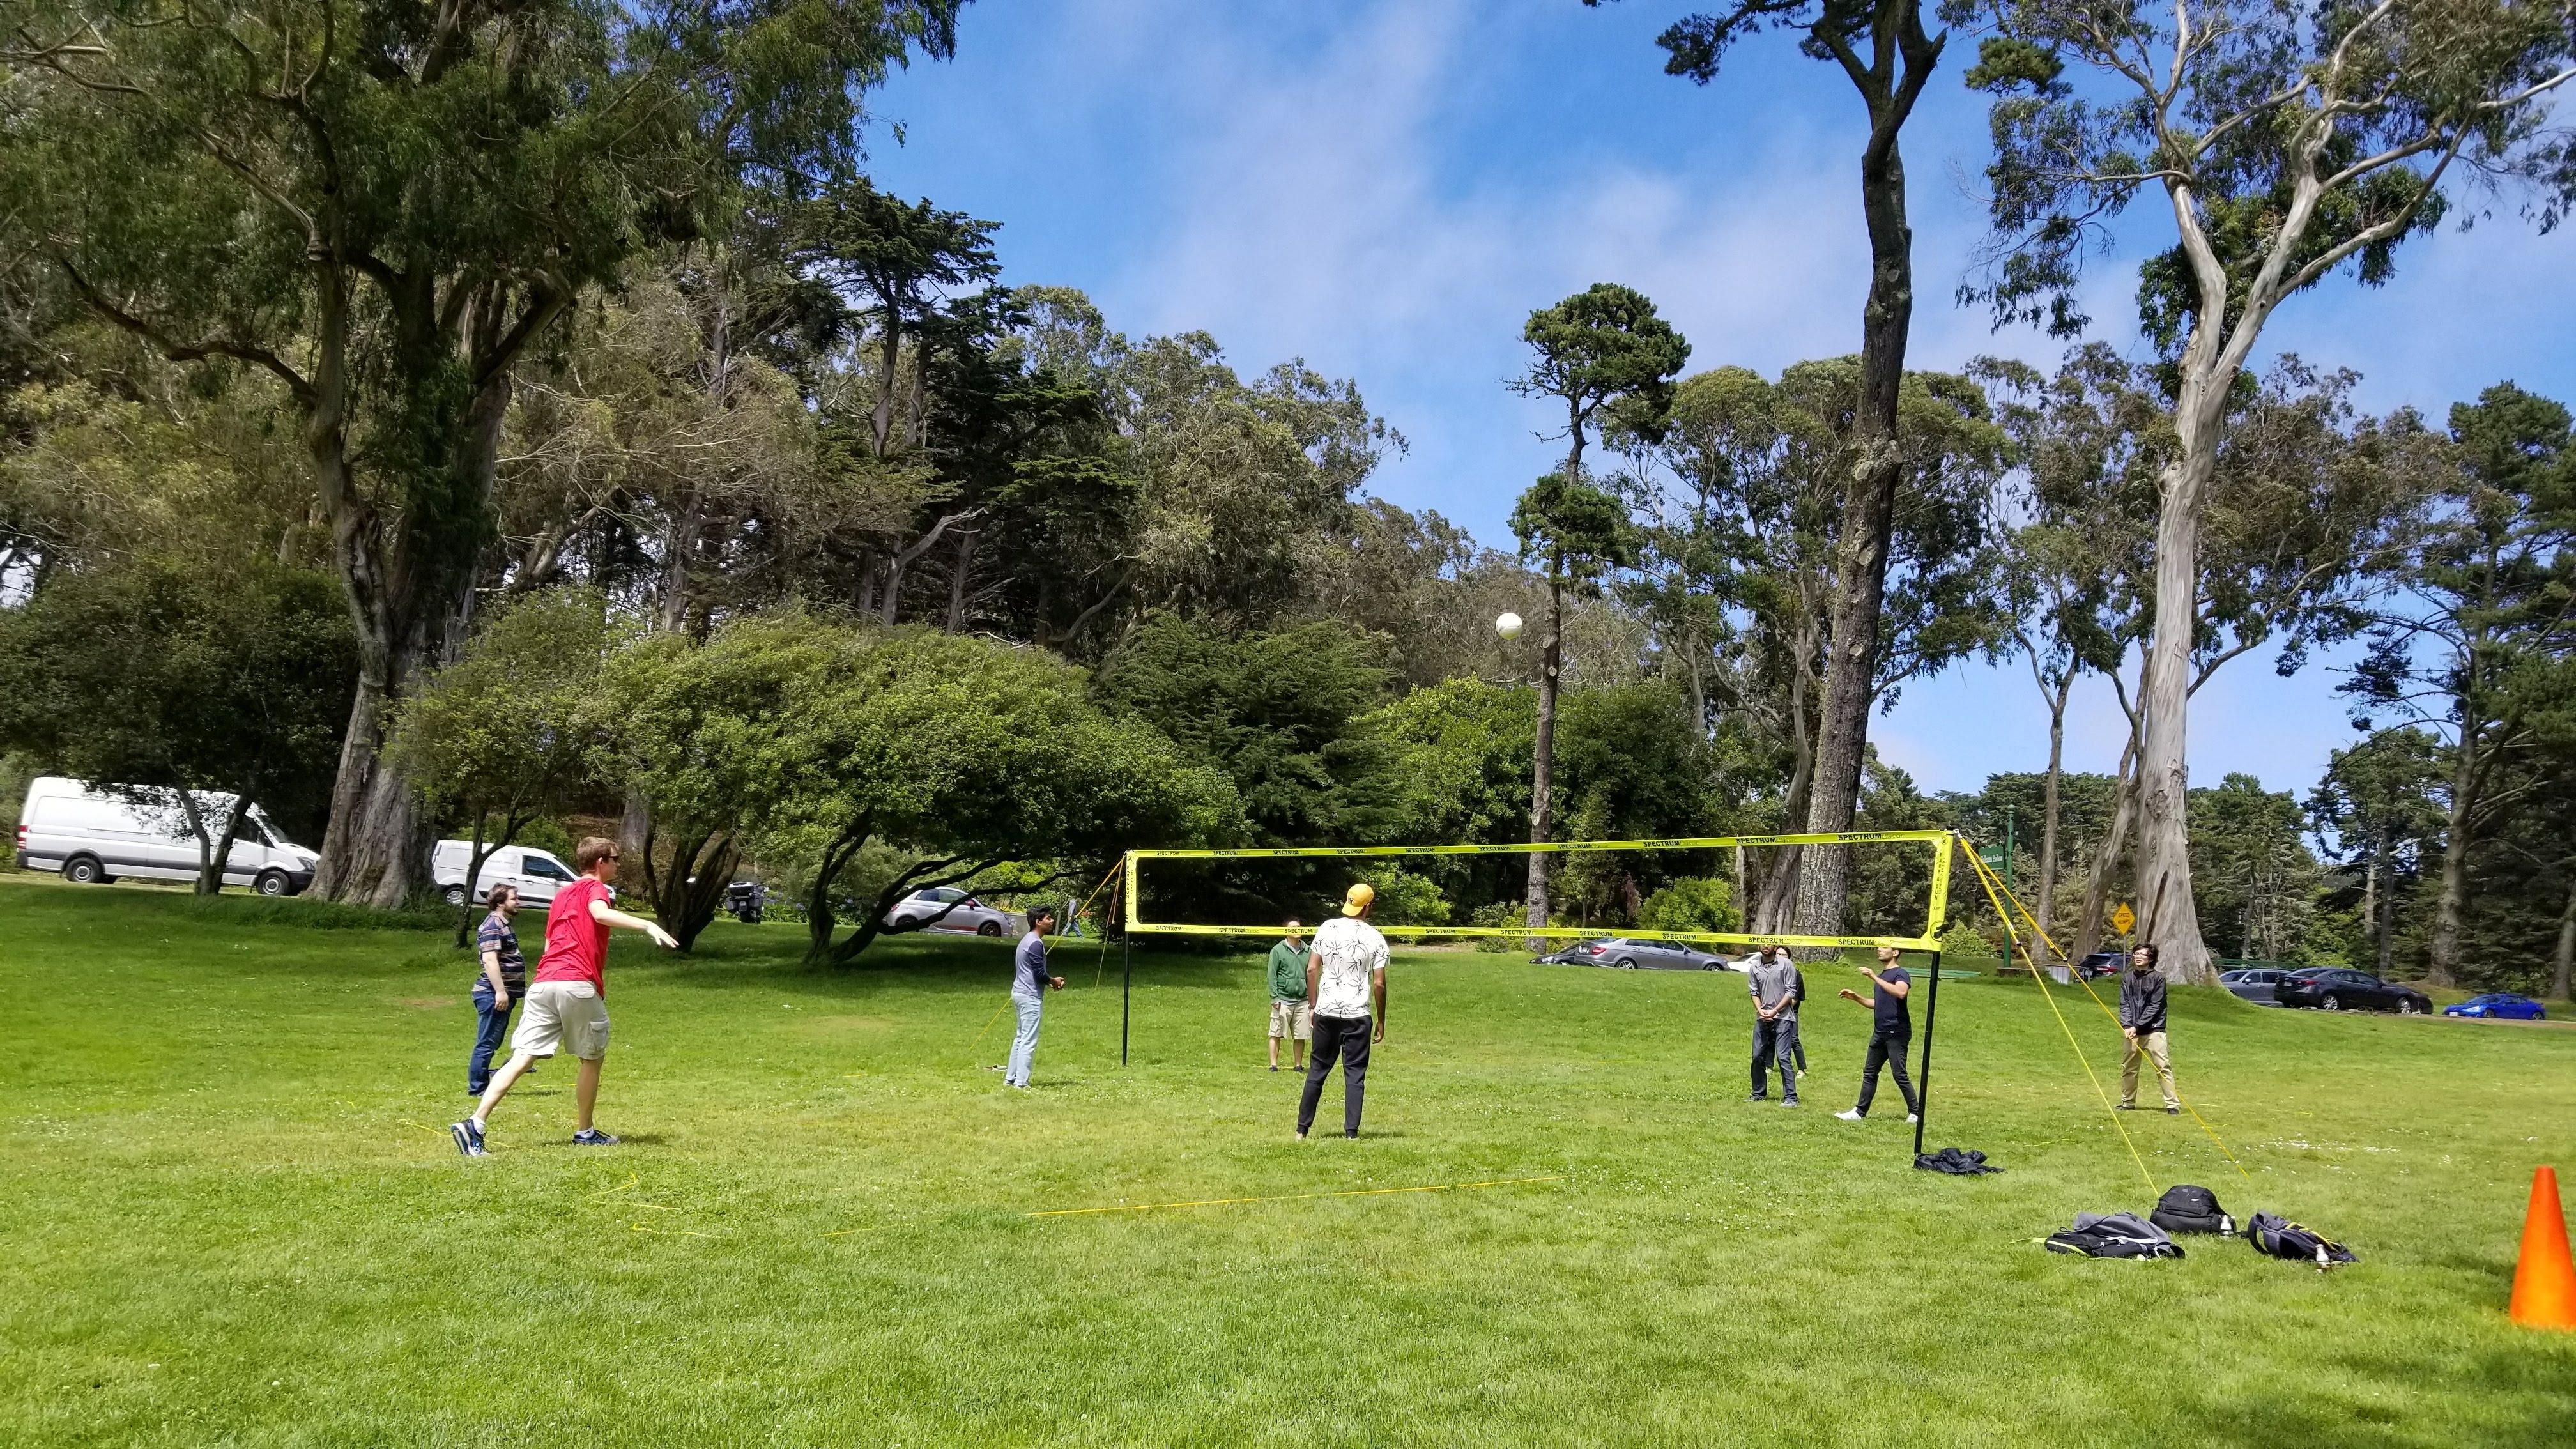 Add-on: Volleyball